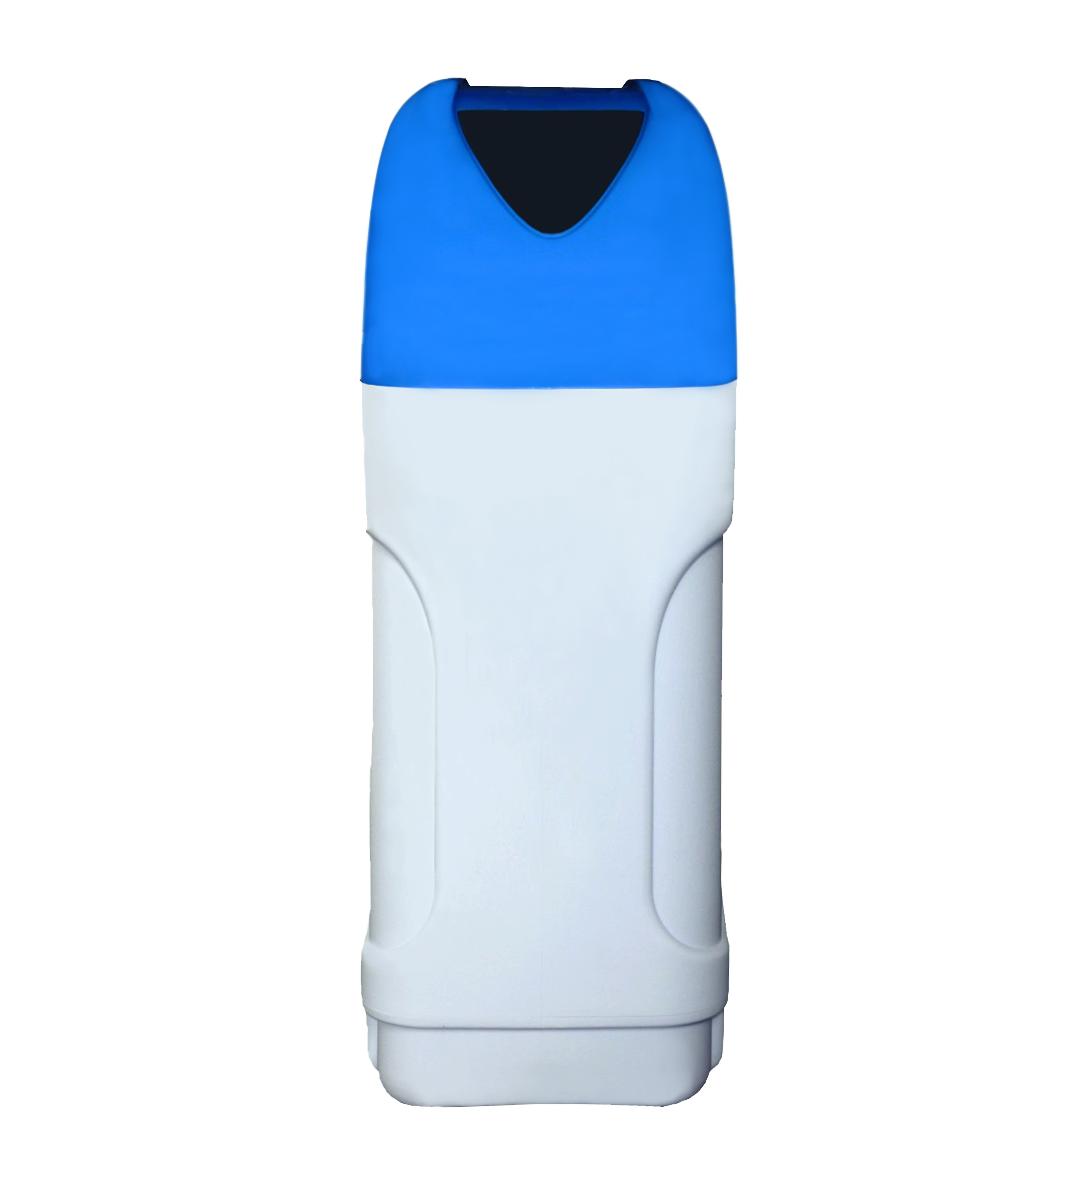 kadosoft-enthaertungsanlage-impression-pro-entkeimung